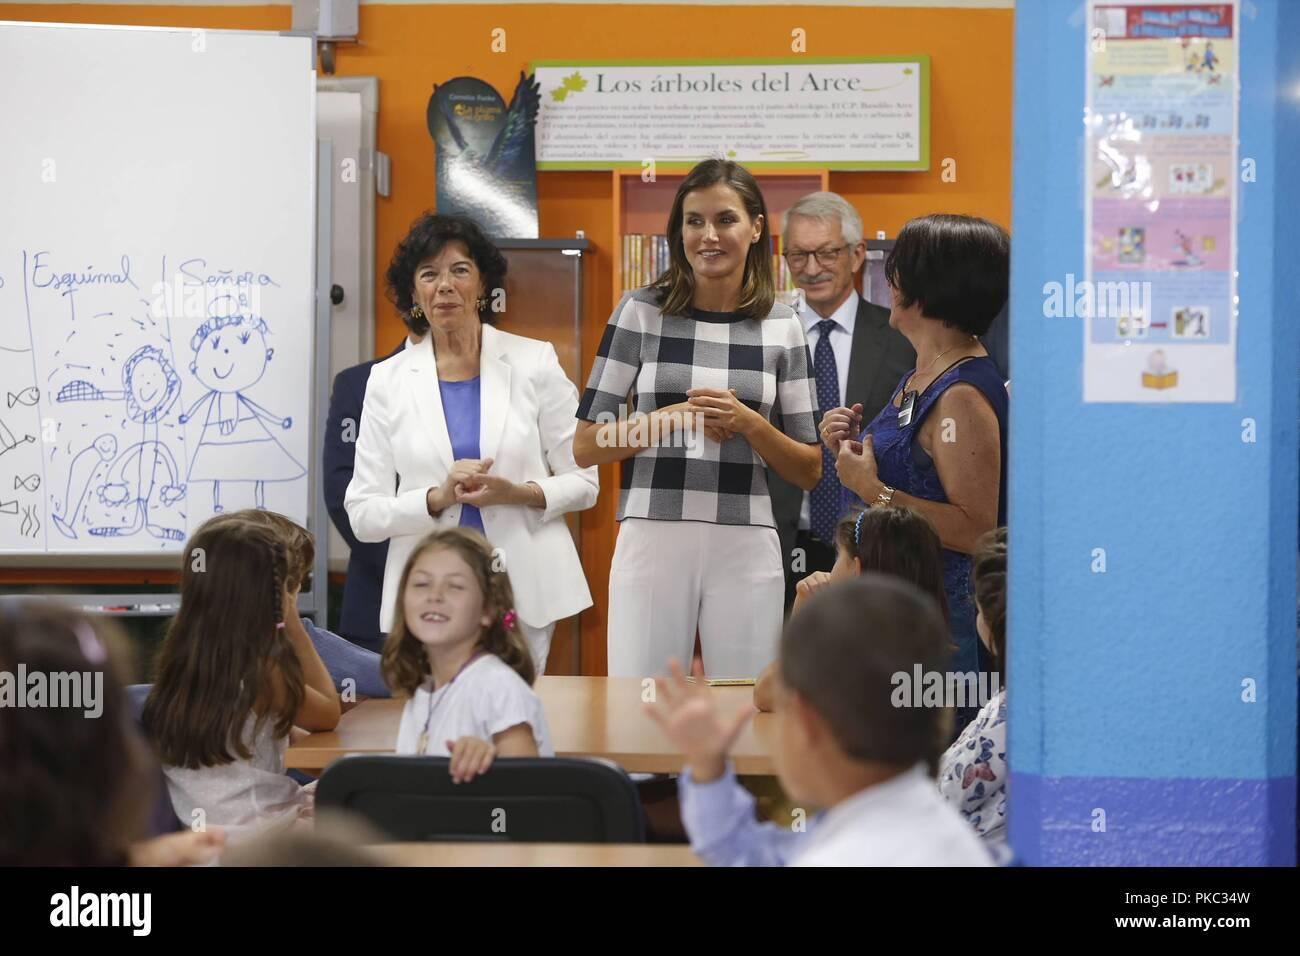 La Reina dona letizia, junto con la ministra de Educación, Isabel Celaa, visita El Colegio Publico Baudilio Arce en Oviedo con motivo del inicio del curso escolar Letizia Ortiz;ISABEL CELAA; 12/09/2018 Regina Letizia, insieme con il Ministro della Pubblica Istruzione, Isabel Celaa, visiti la Baudilio Arce scuola pubblica di Oviedo all inizio dell anno scolastico. 888/Cordon premere Immagini Stock